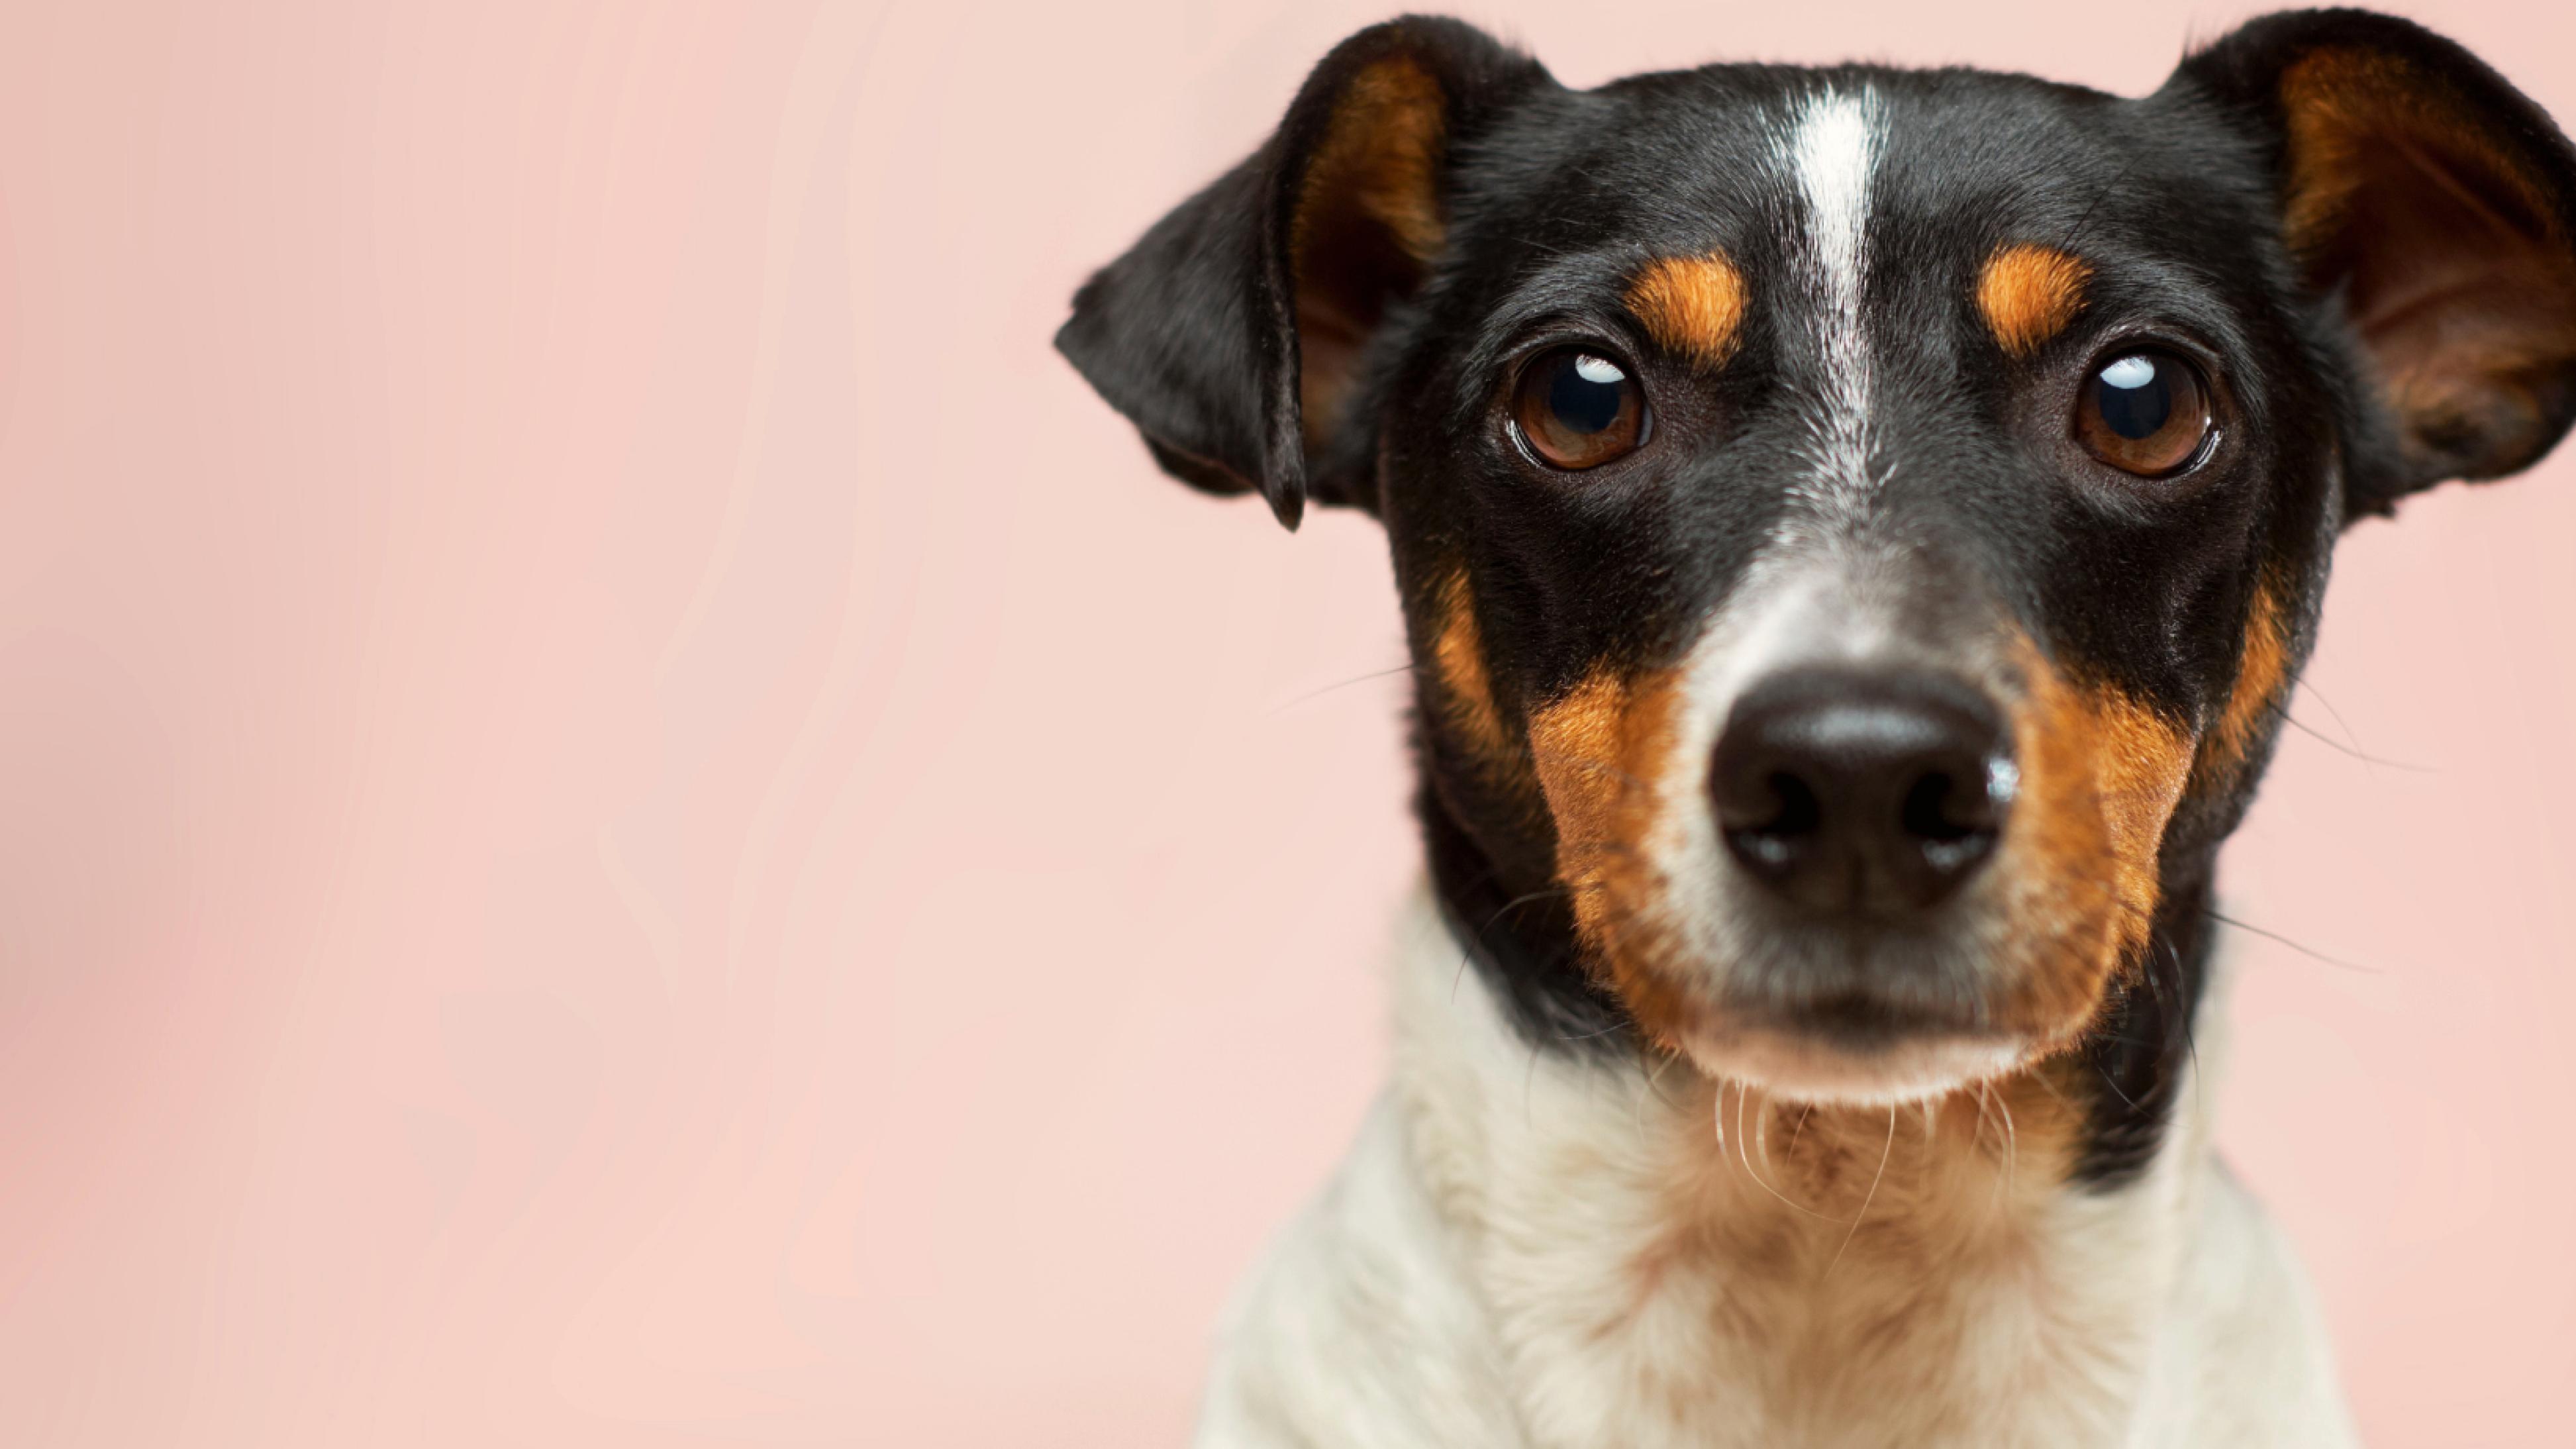 Pet Culture case study hero image